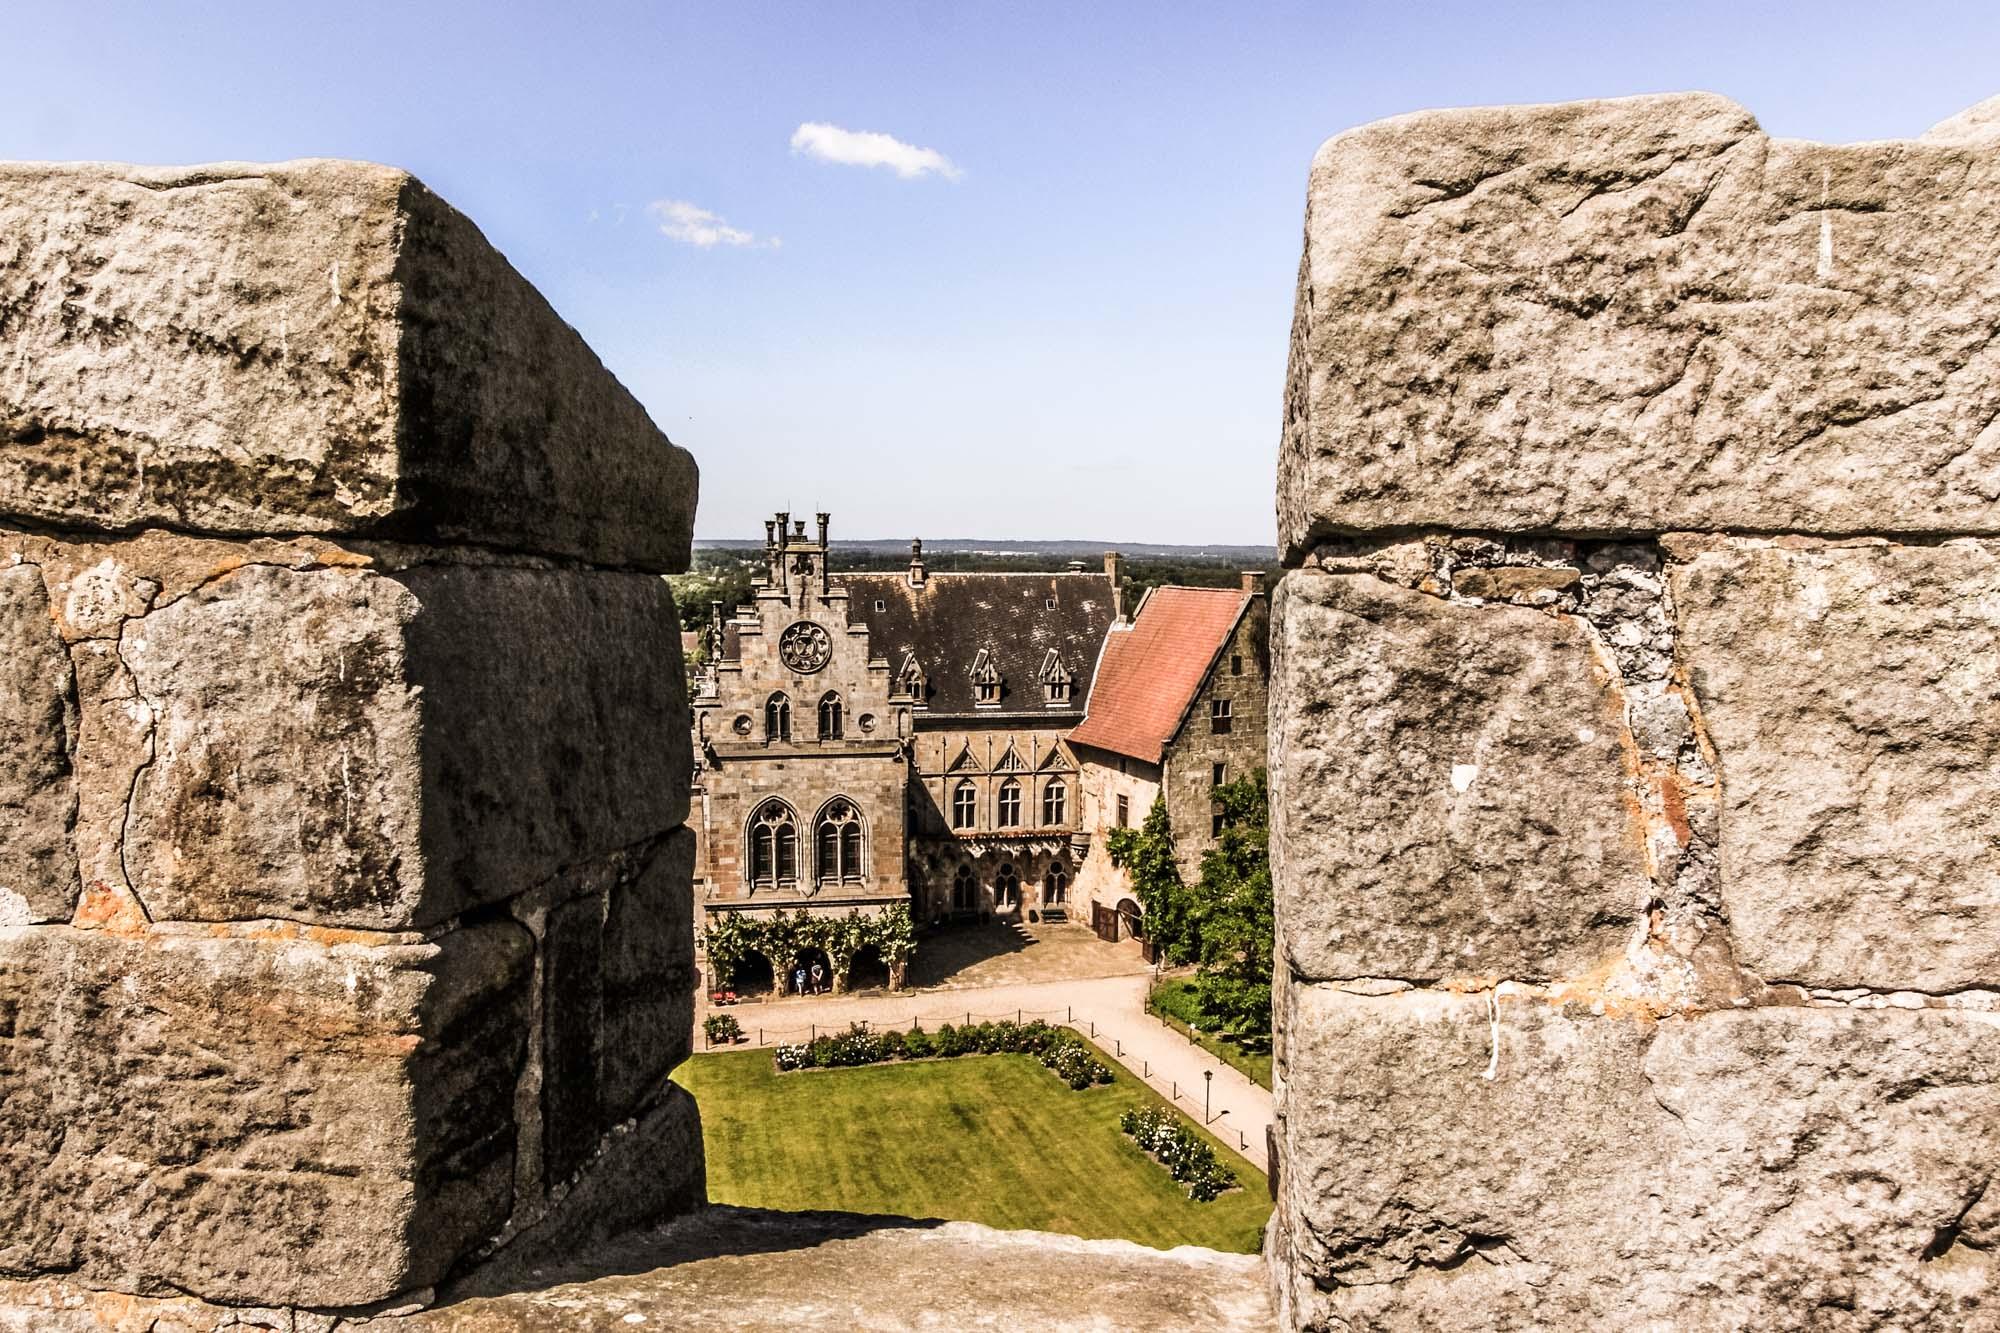 Inner courtyard of Bentheim Castle seen through a pinnacle of the Powder Tower ©Thomas Wallmeyer